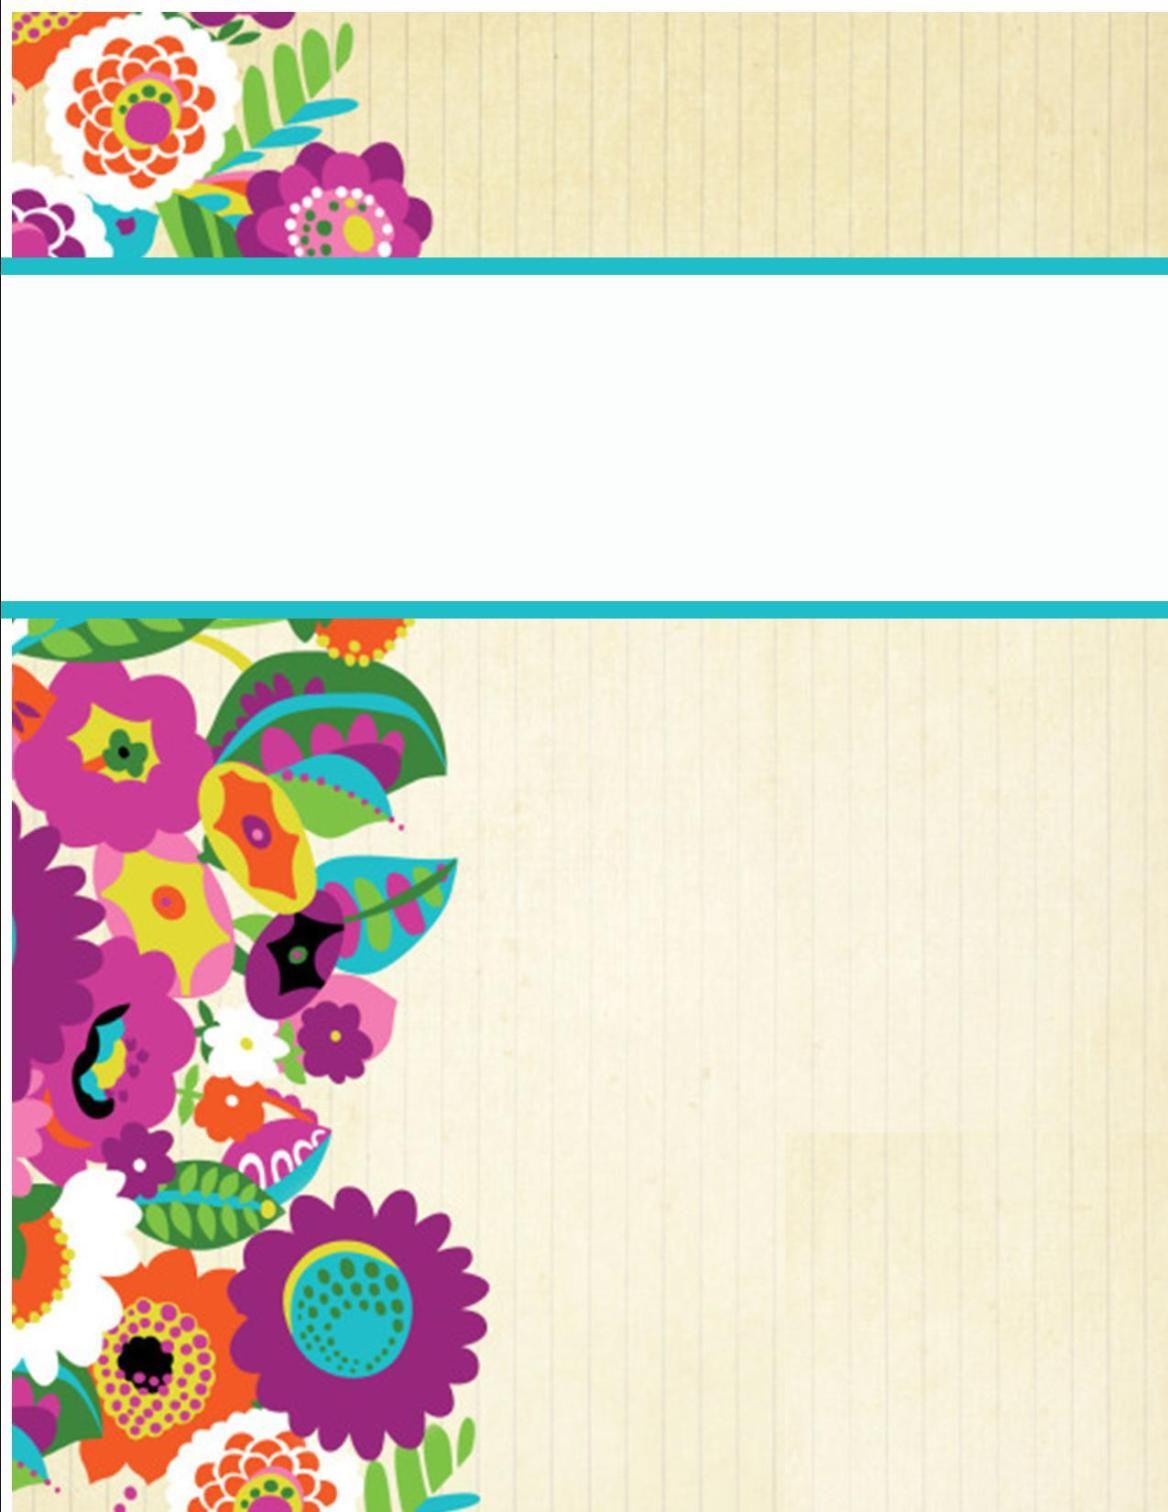 My Cute Binder Covers | printable by Evony Brown | Pinterest